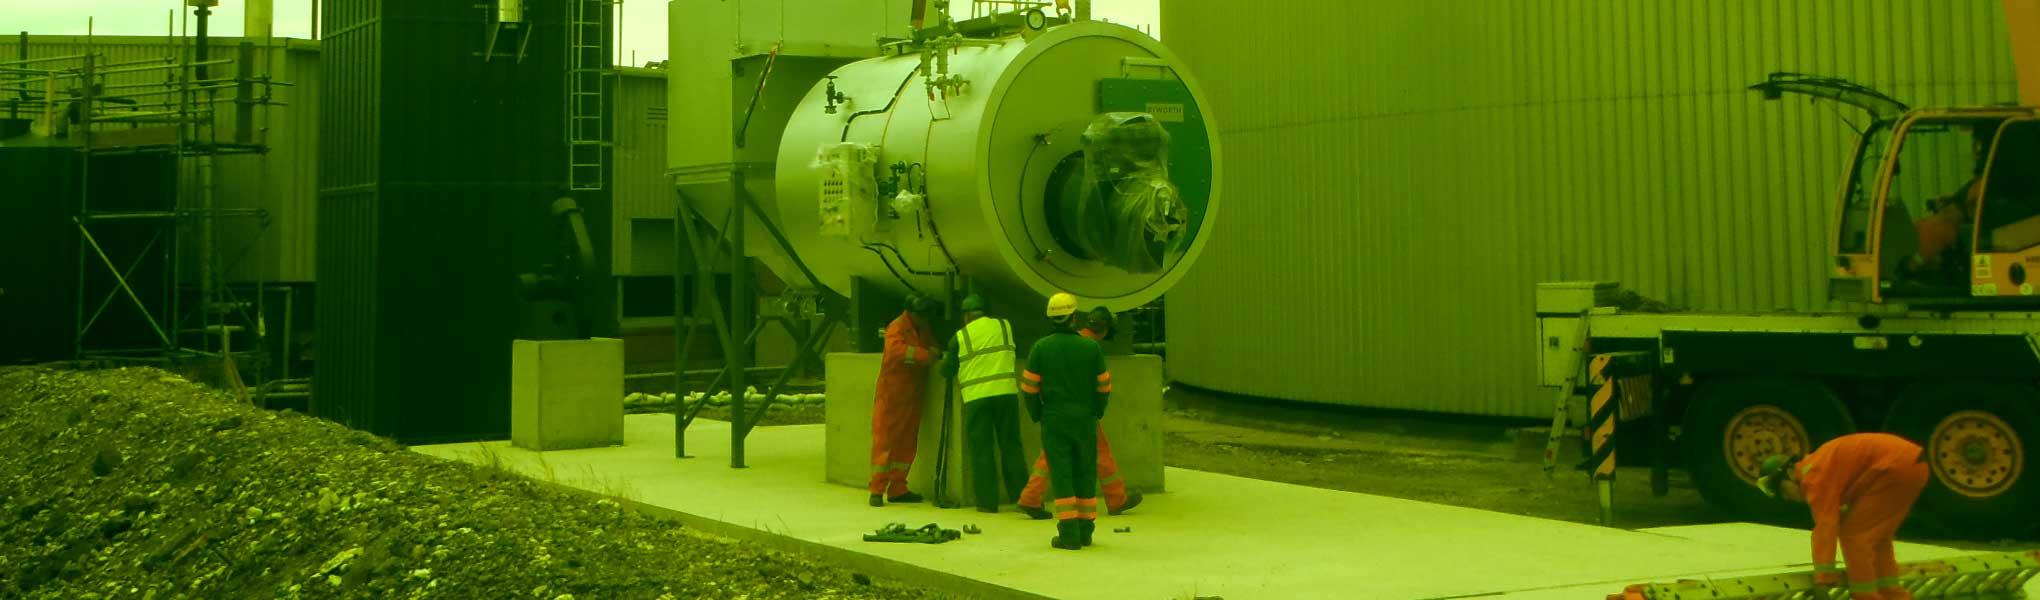 Boiler installation at Immingham